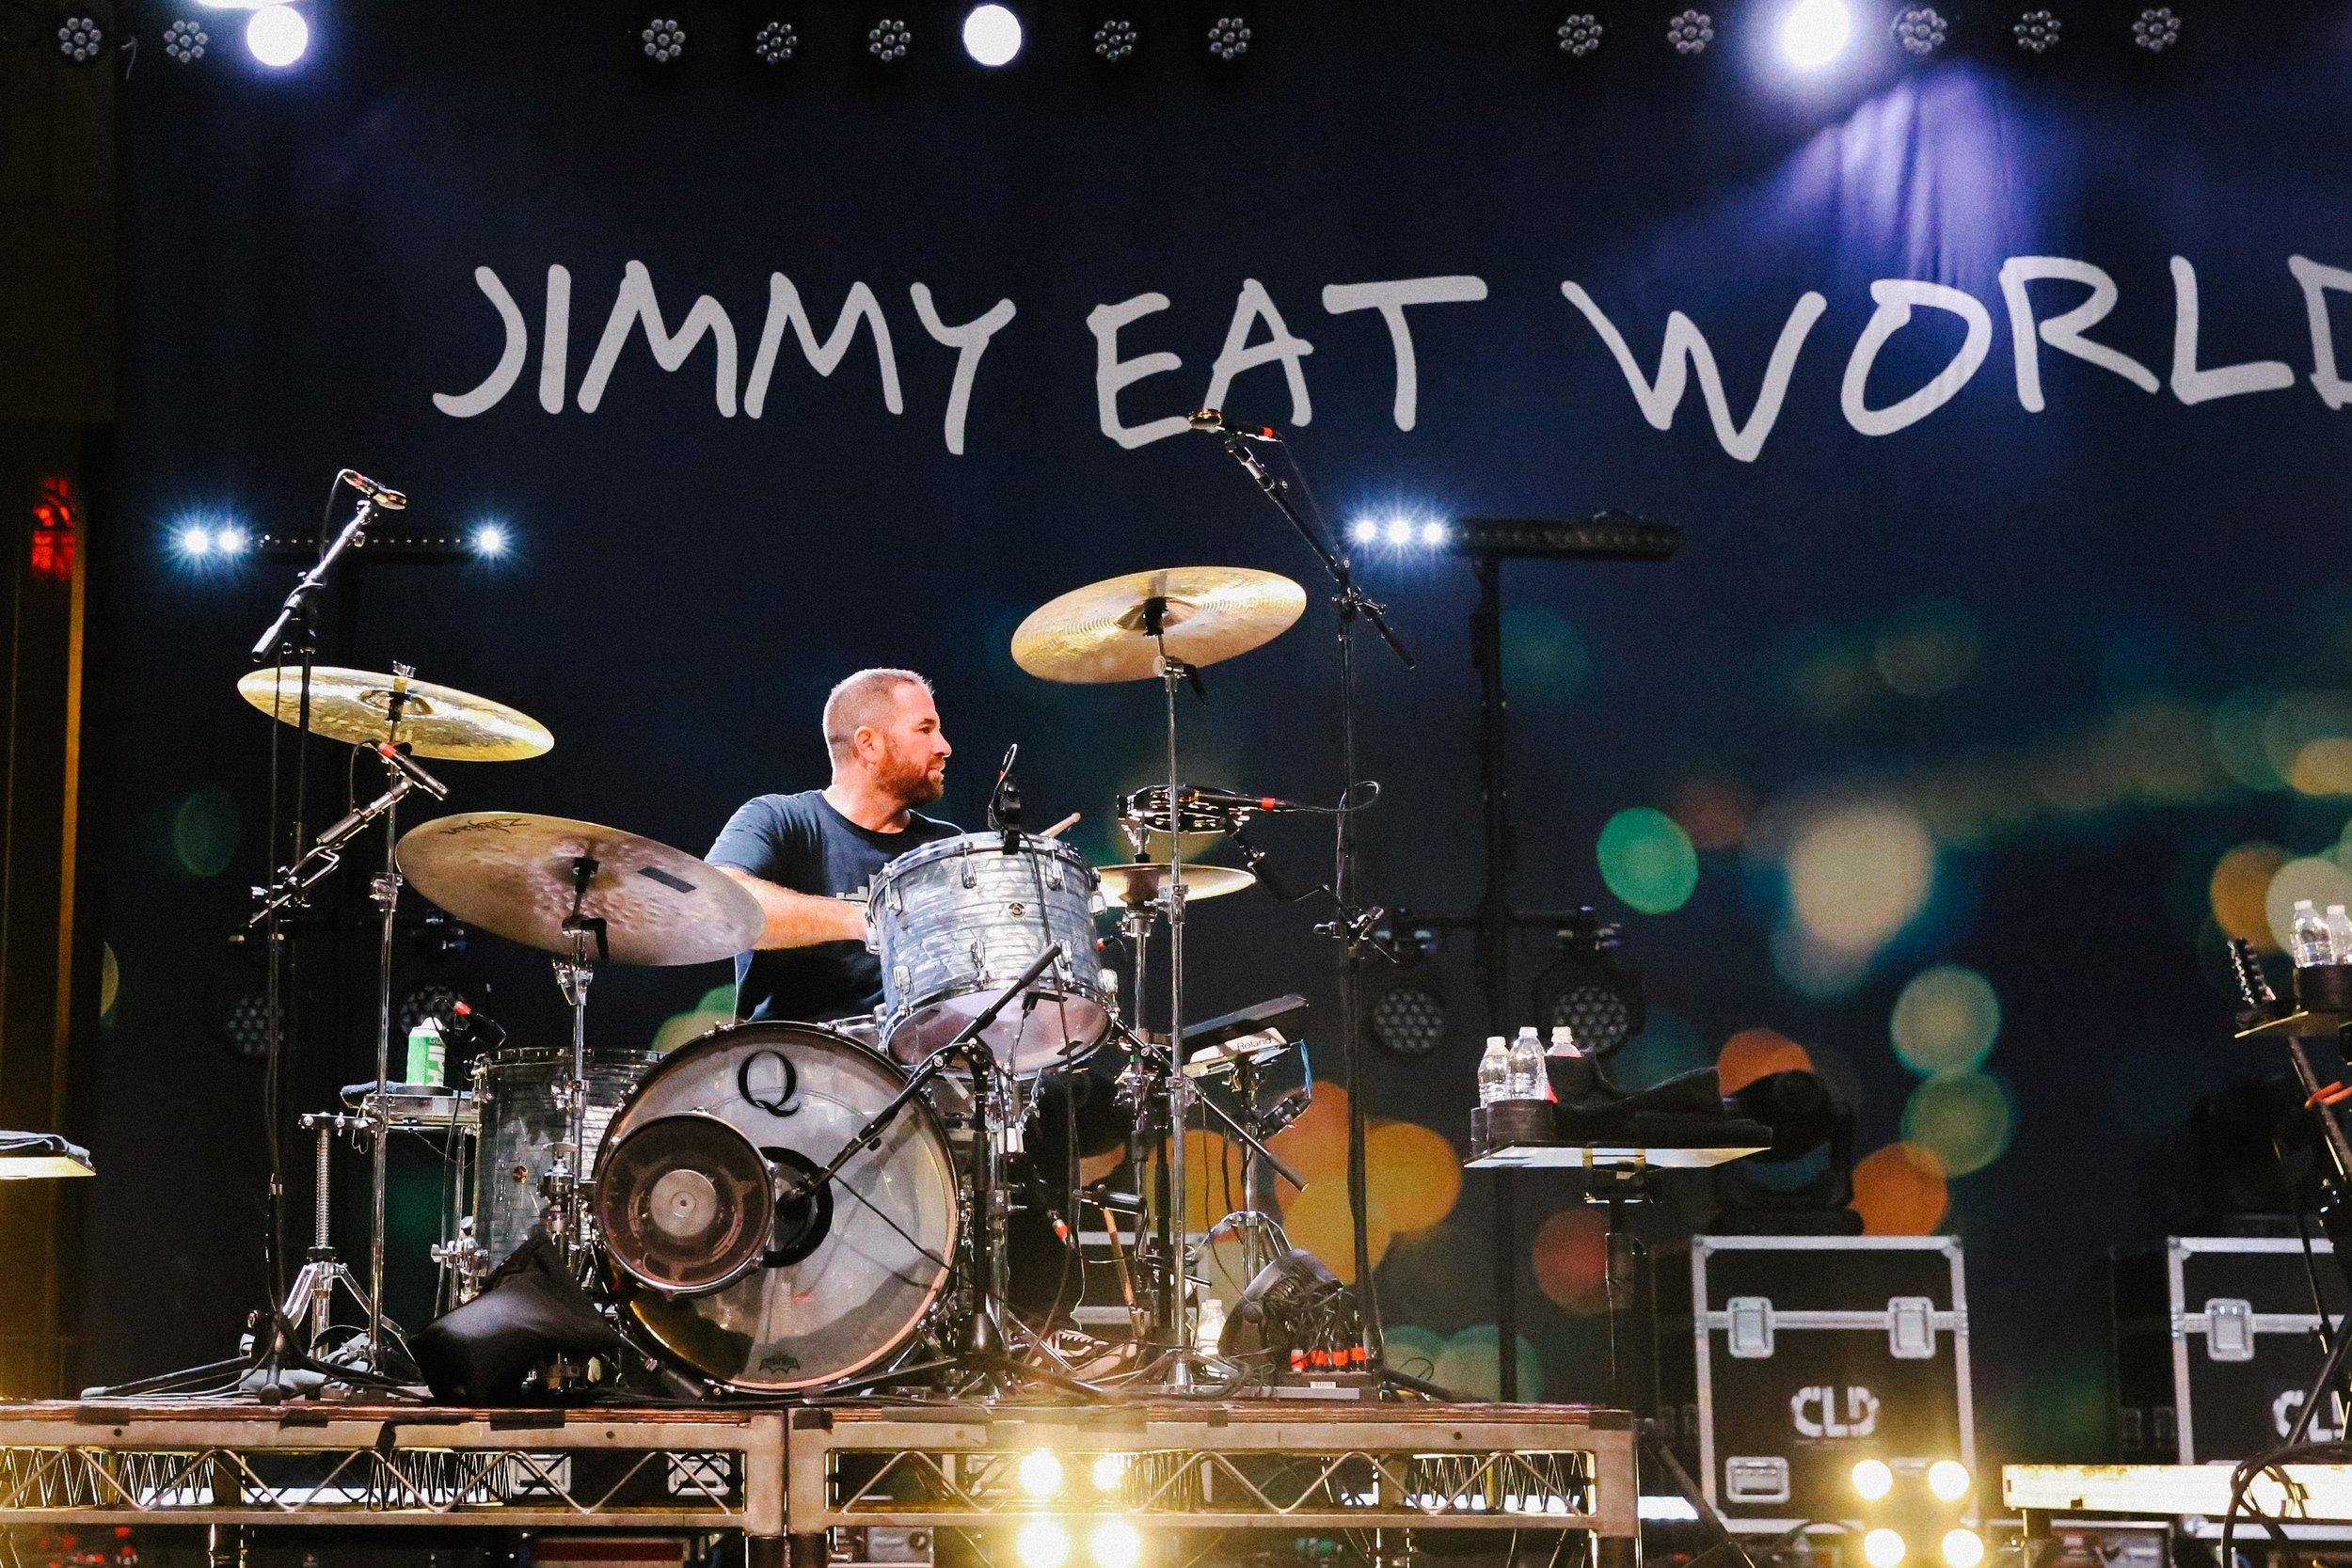 JimmyEatWorld_LOTG_TN2018-21.jpg